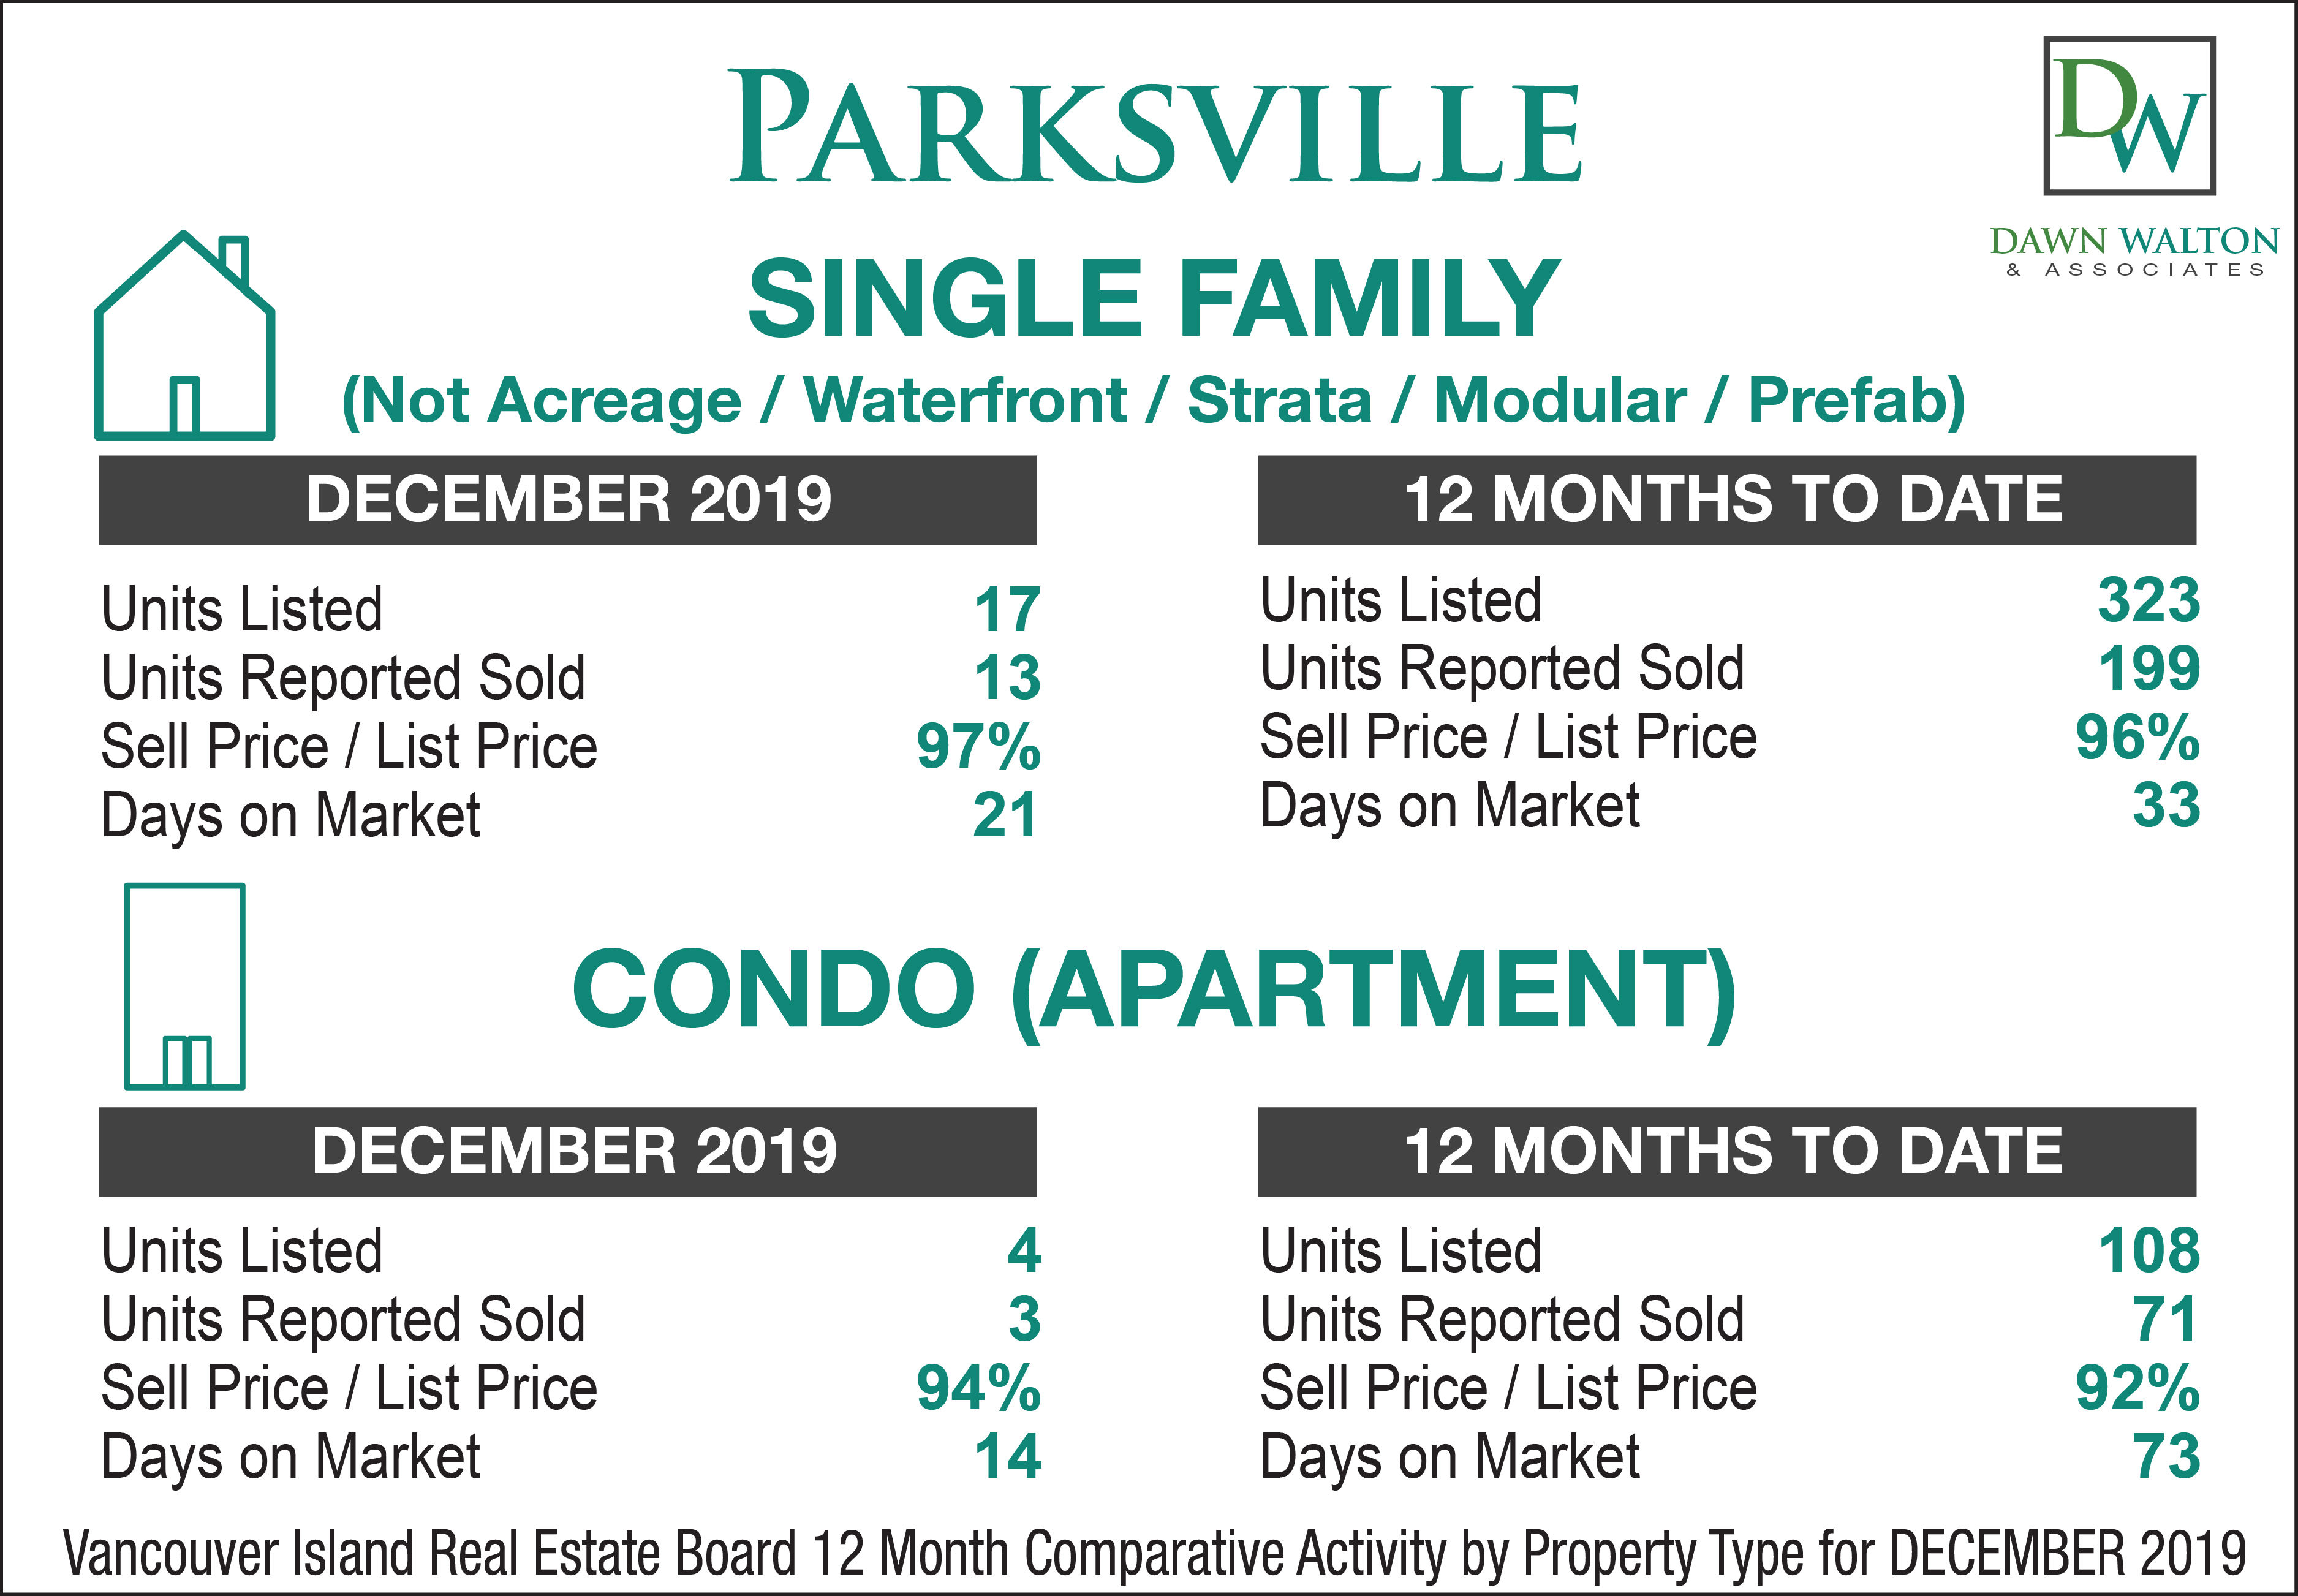 Parksville Real Estate Market Stats December  2019 - Nanaimo Realtor Dawn Walton